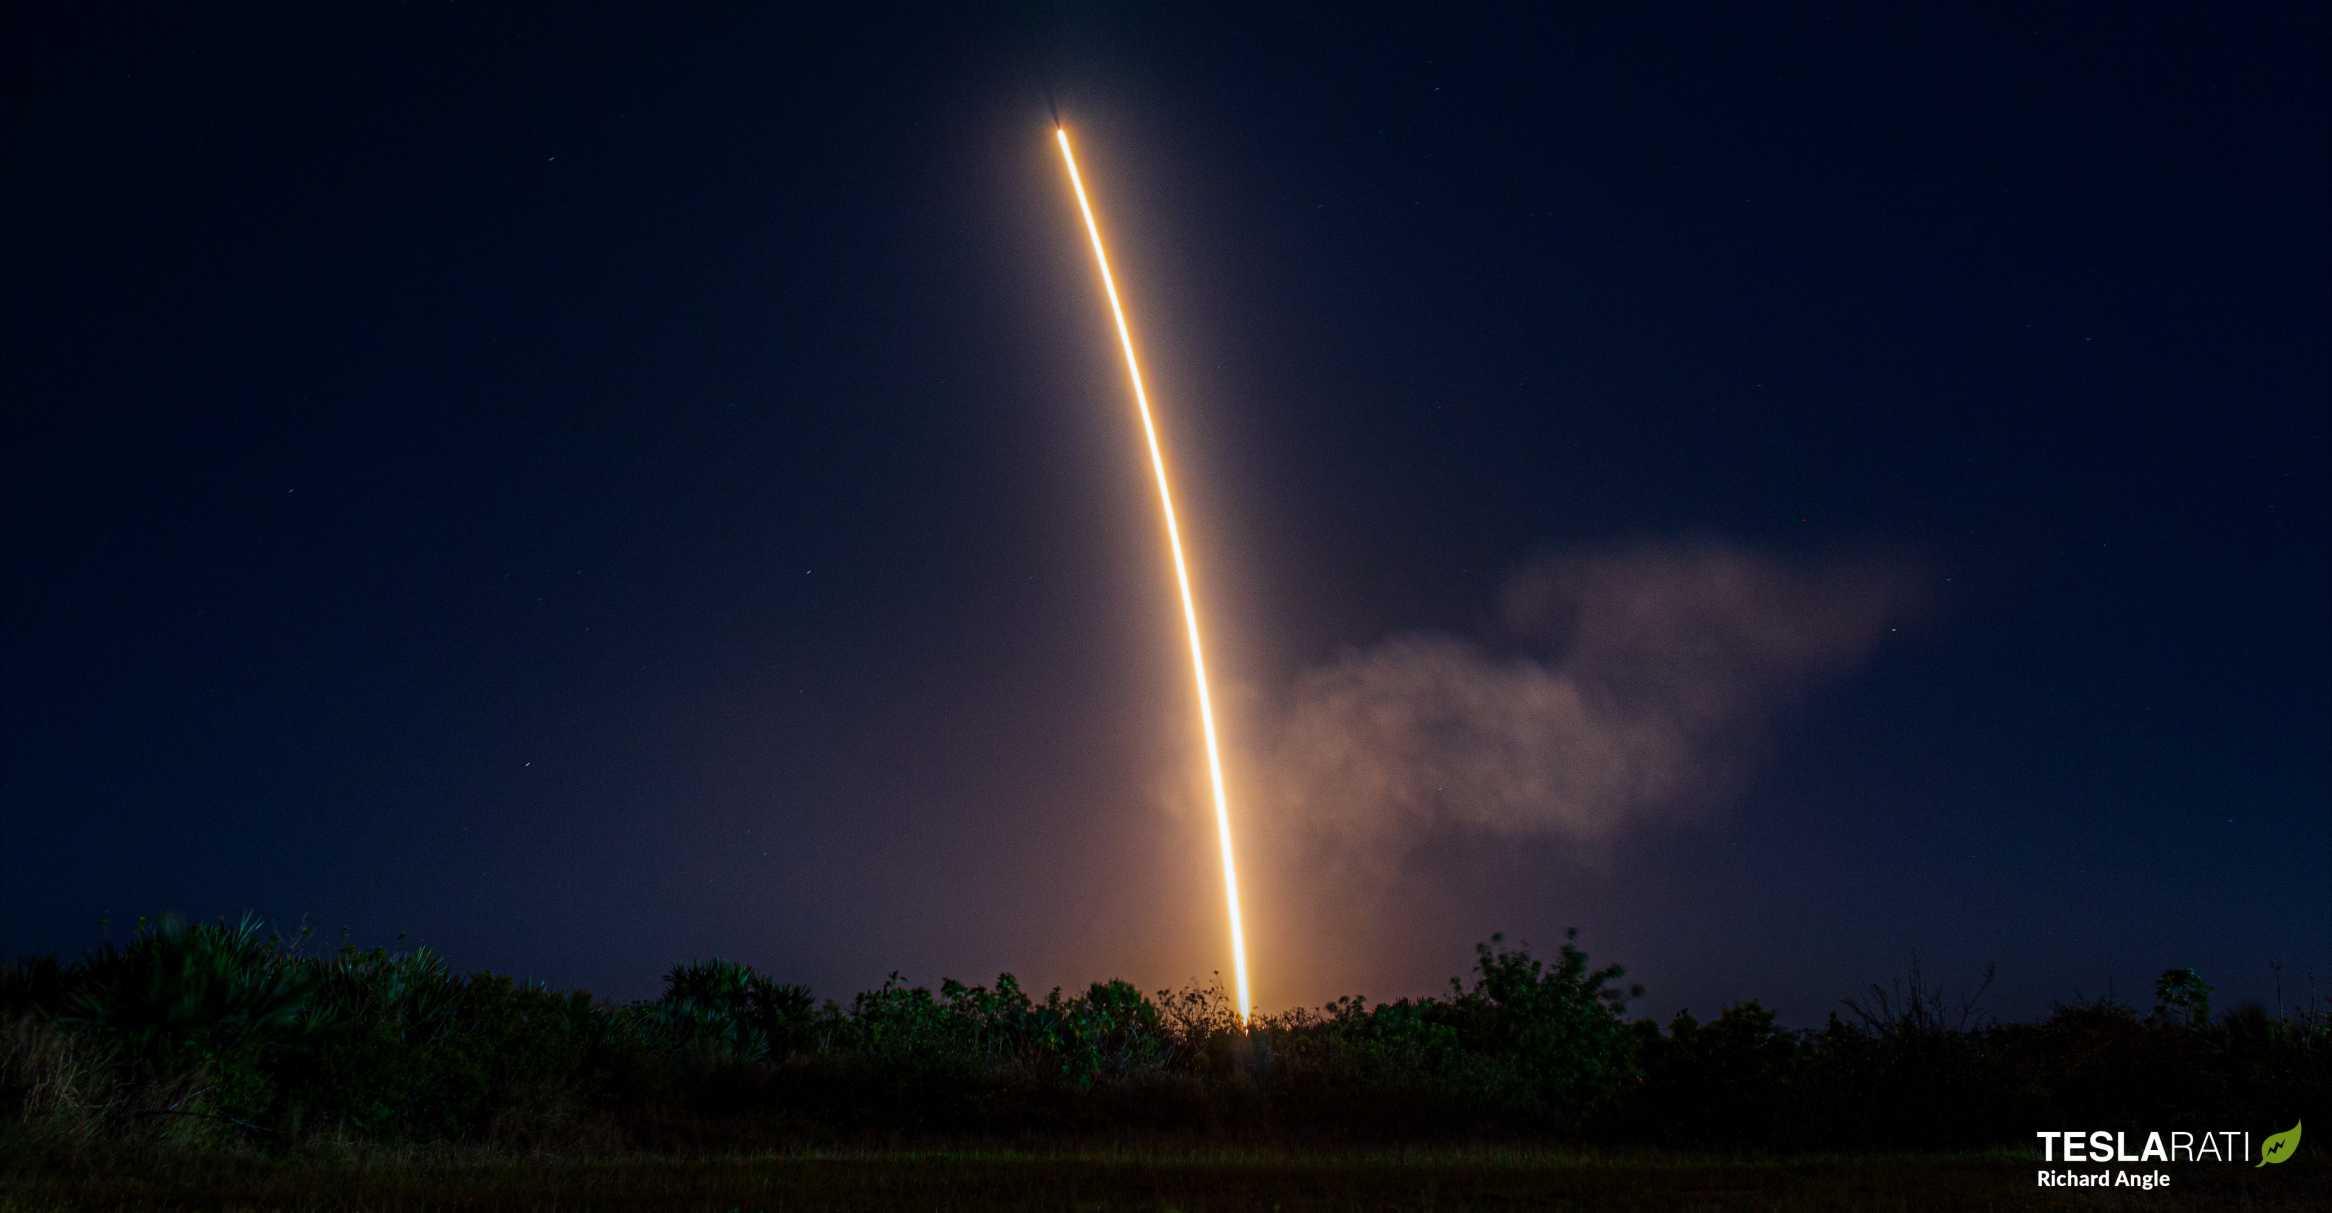 CRS-20 Dragon C112 Falcon 9 B1059 (Richard Angle) pre launch landing (20) crop (c)